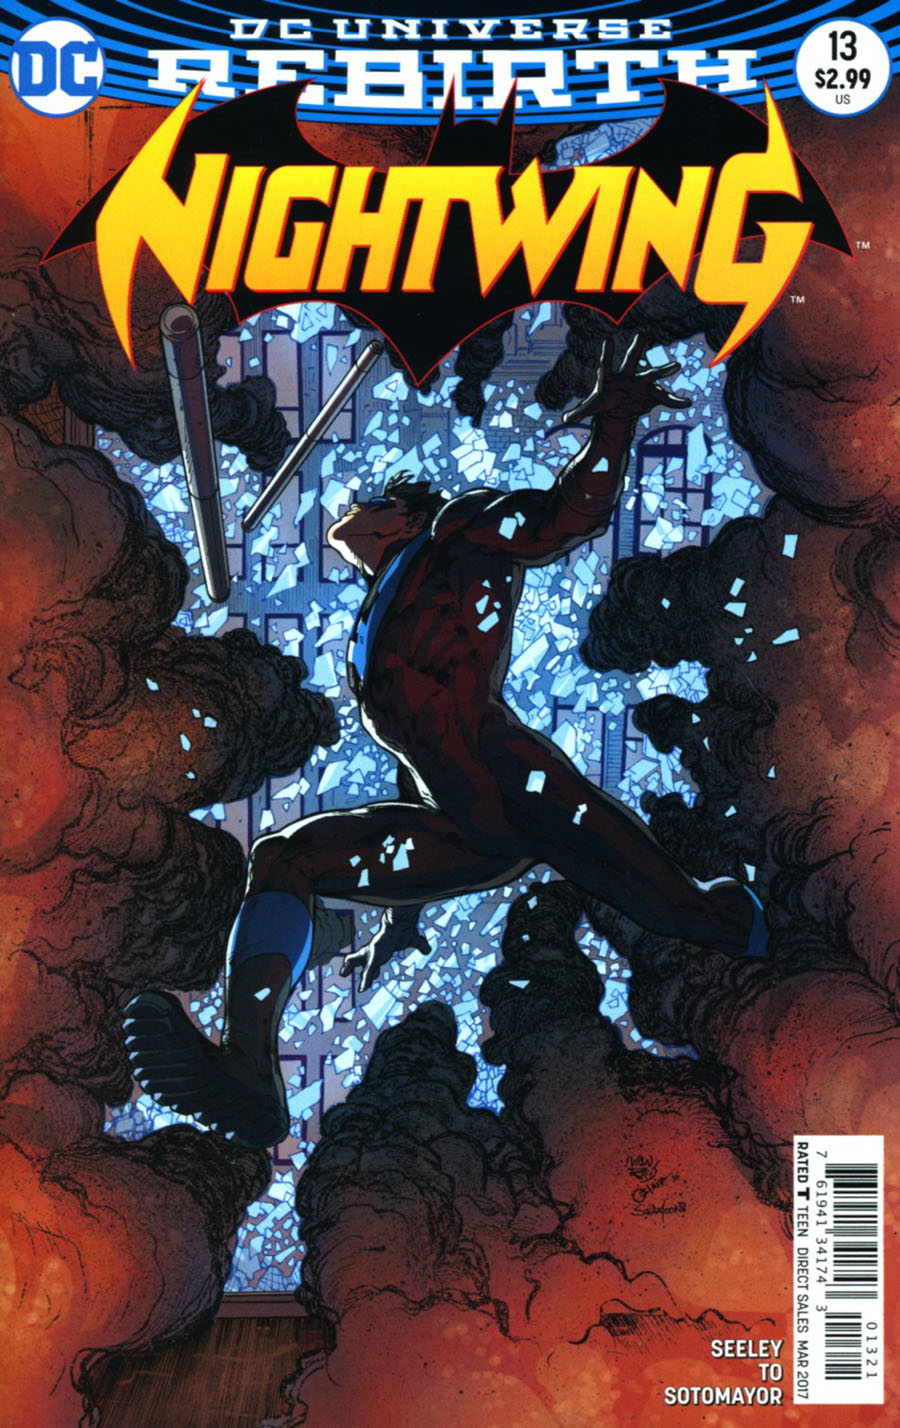 Nightwing Vol 4 #13 Cover B Variant Ivan Reis & Oclair Albert Cover